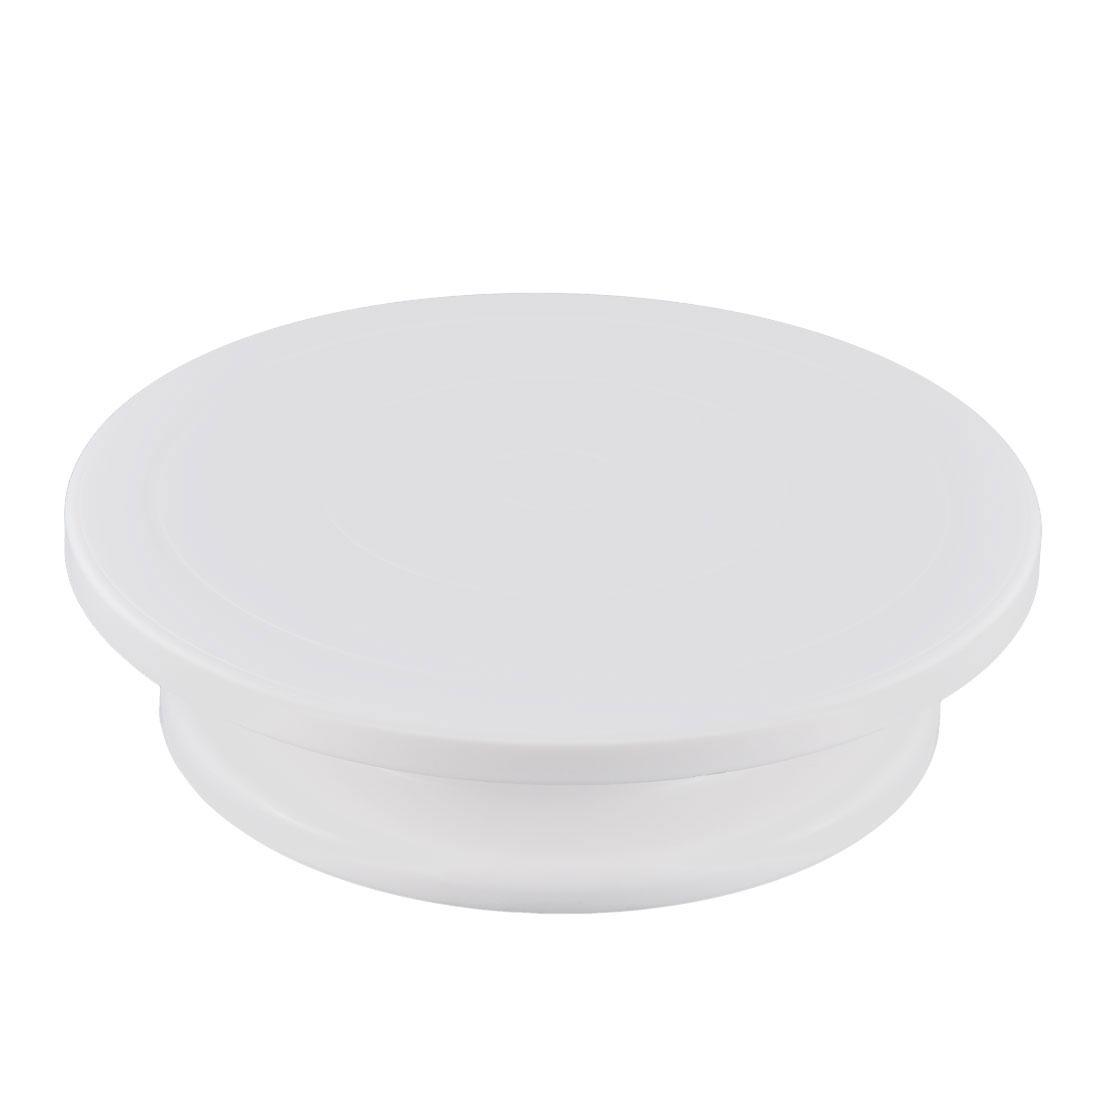 Plastic Revolving Dessert Decorating Display Stand Cake Turntable White